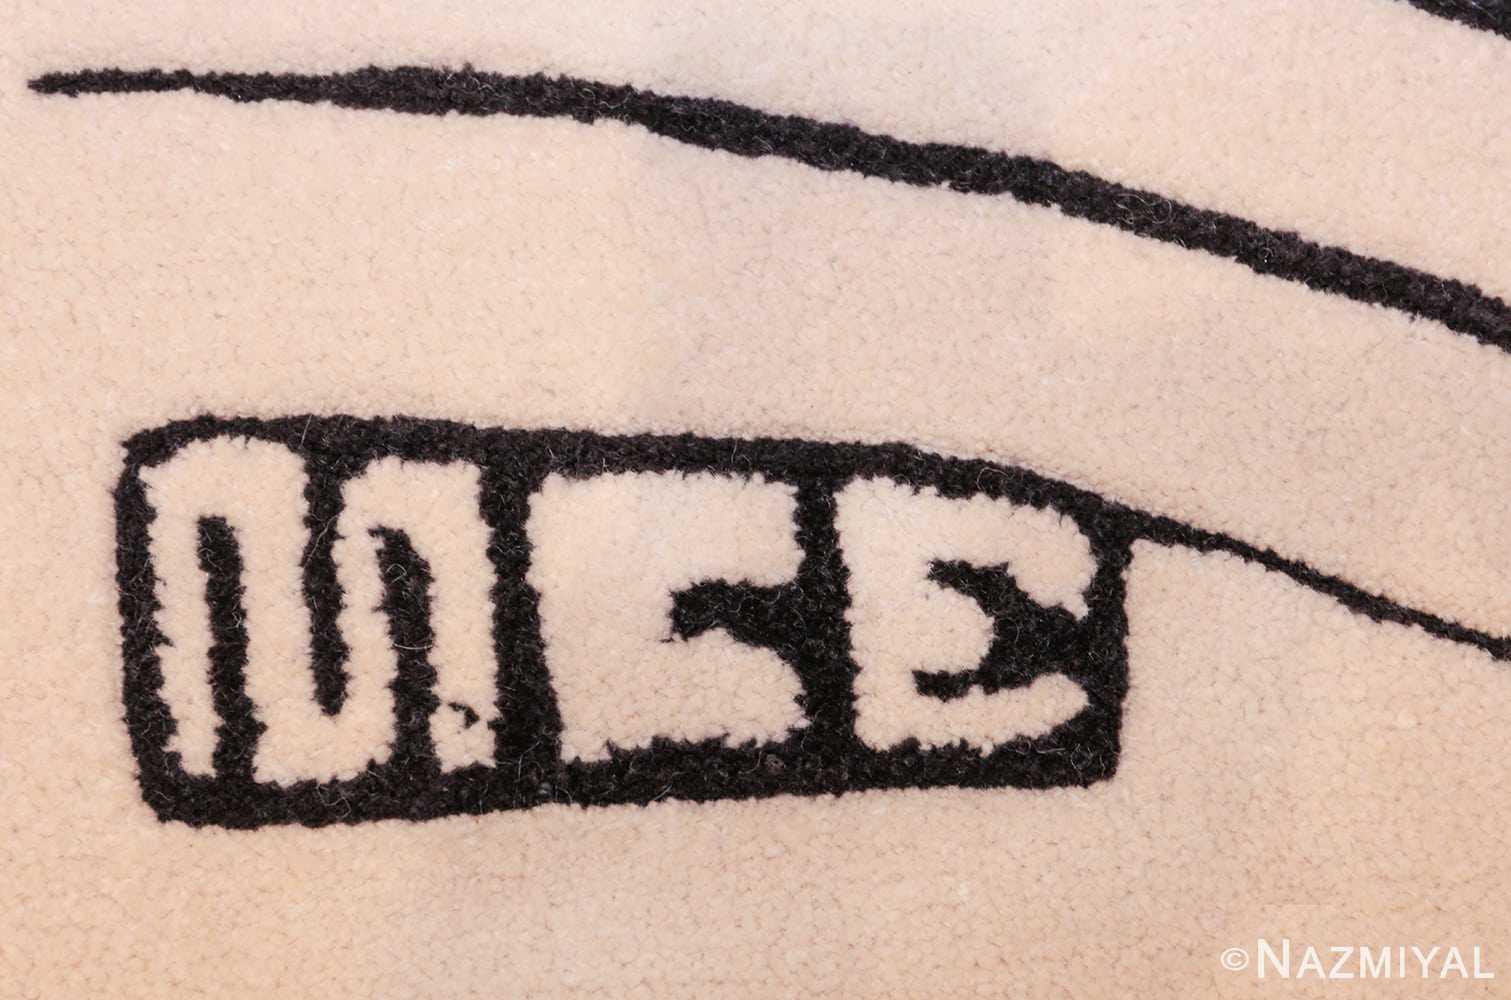 black and white vintage maurits escher designed scandinavian fish rug 49662 signature Nazmiyal